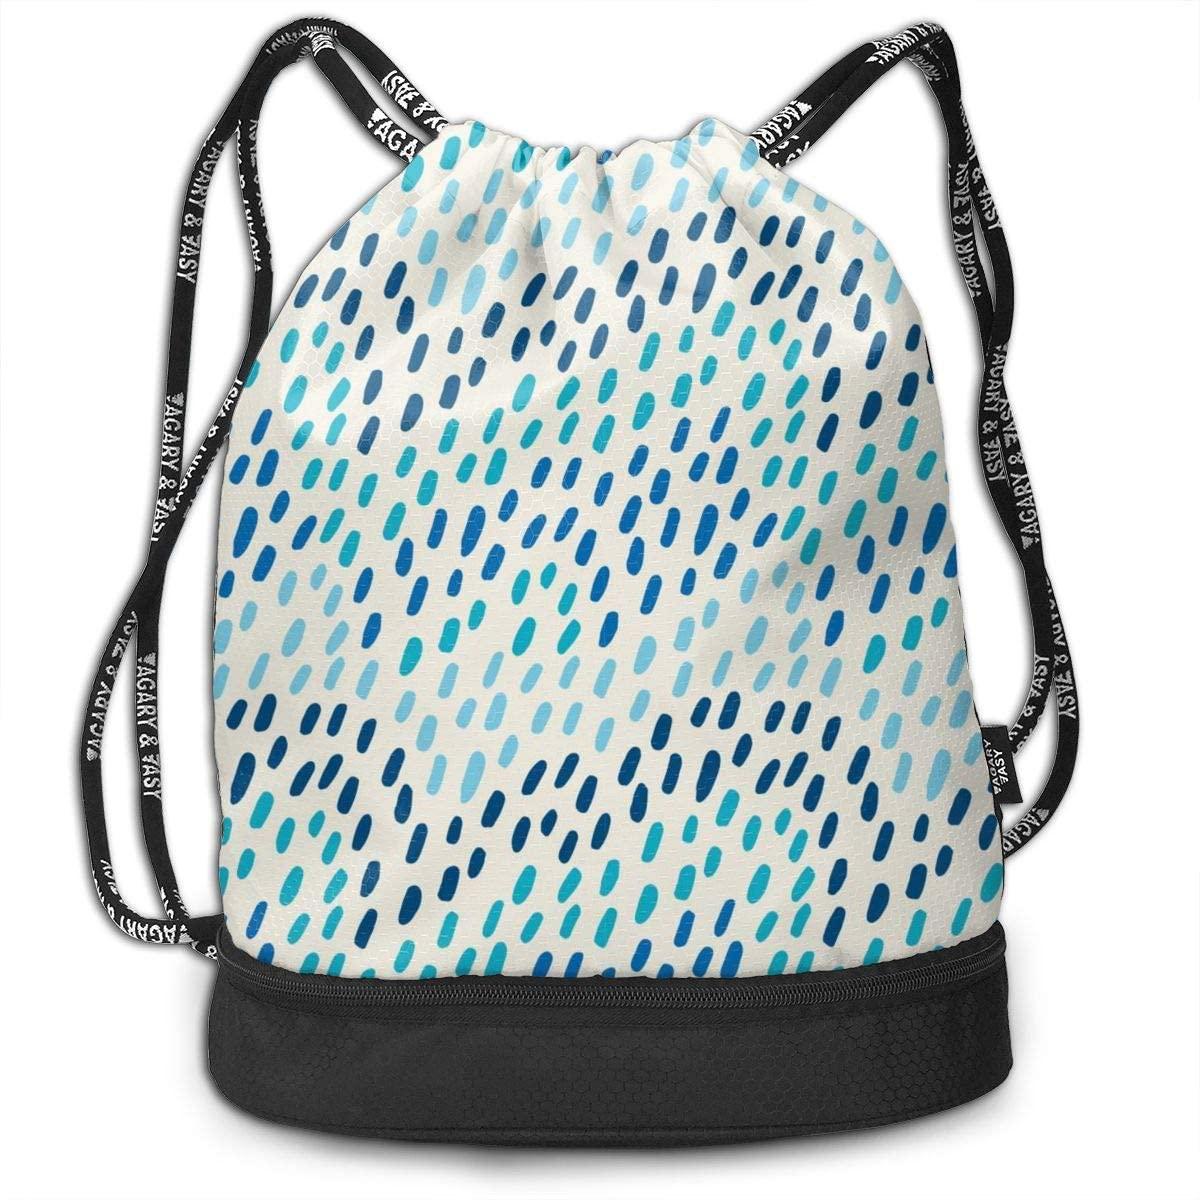 Bundle Backpacks Hand Drawn Pattern. Blue Waves Gym Sack Drawstring Bags Casual Daypack Yoga Bag School Training Pouch